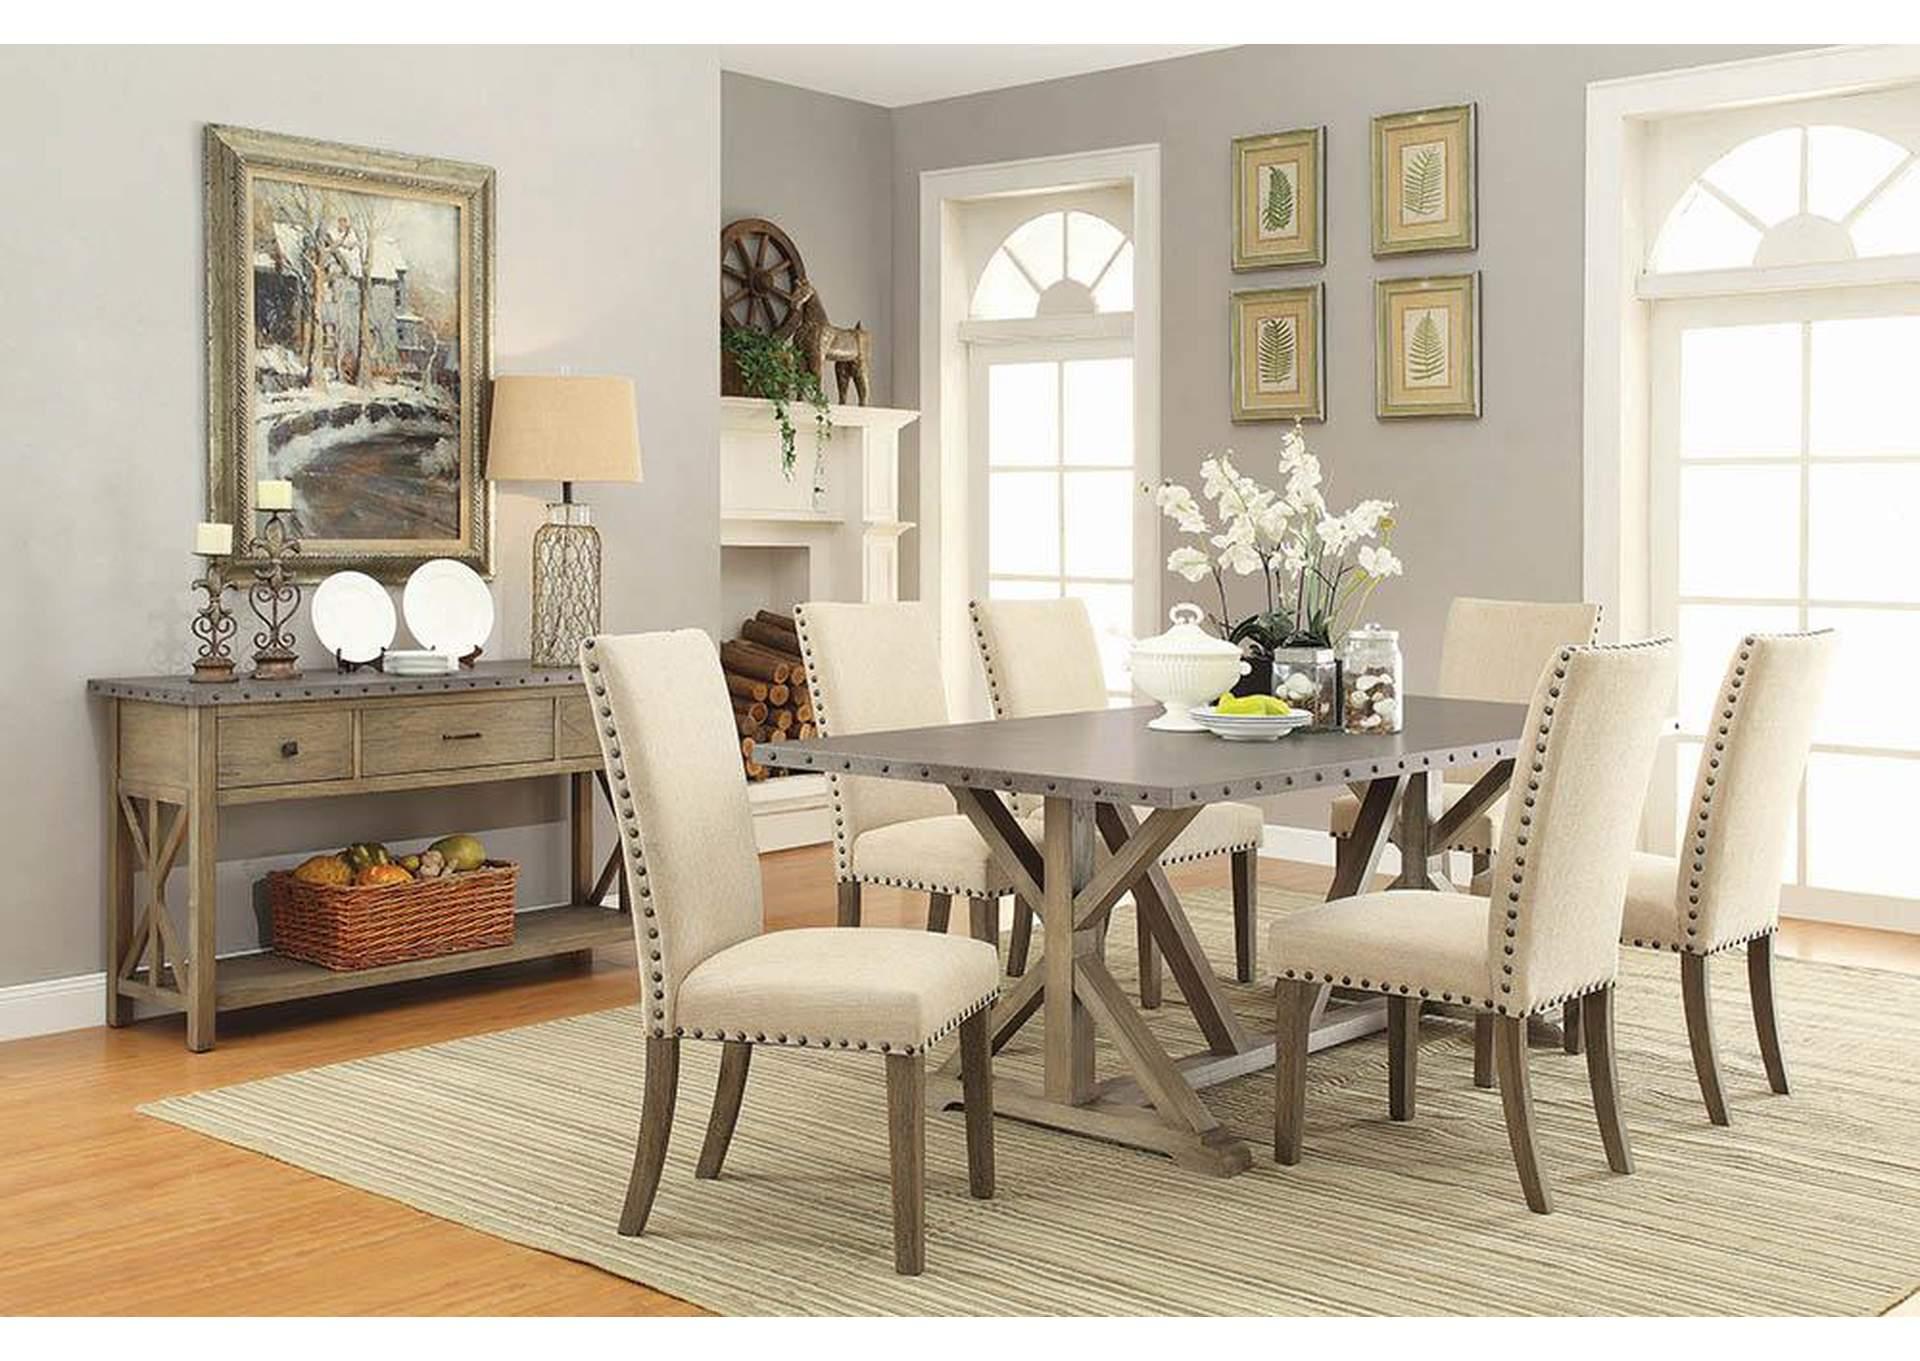 Furniture Distributors Havelock Nc Beige Dining Chair